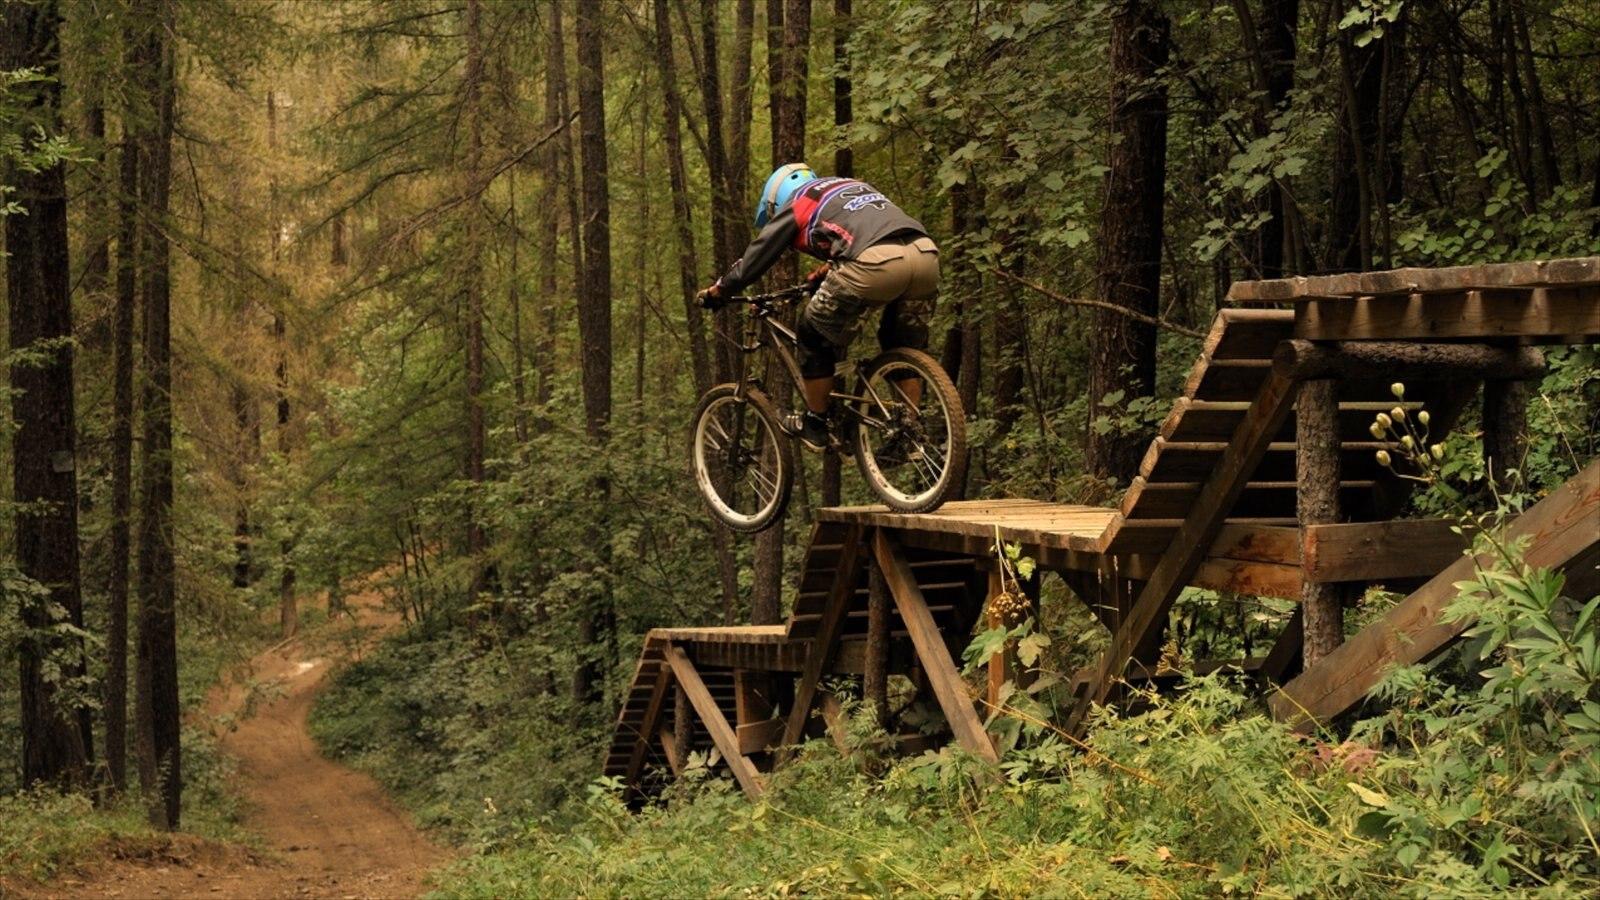 Bardonecchia Ski Resort caracterizando florestas e mountain bike